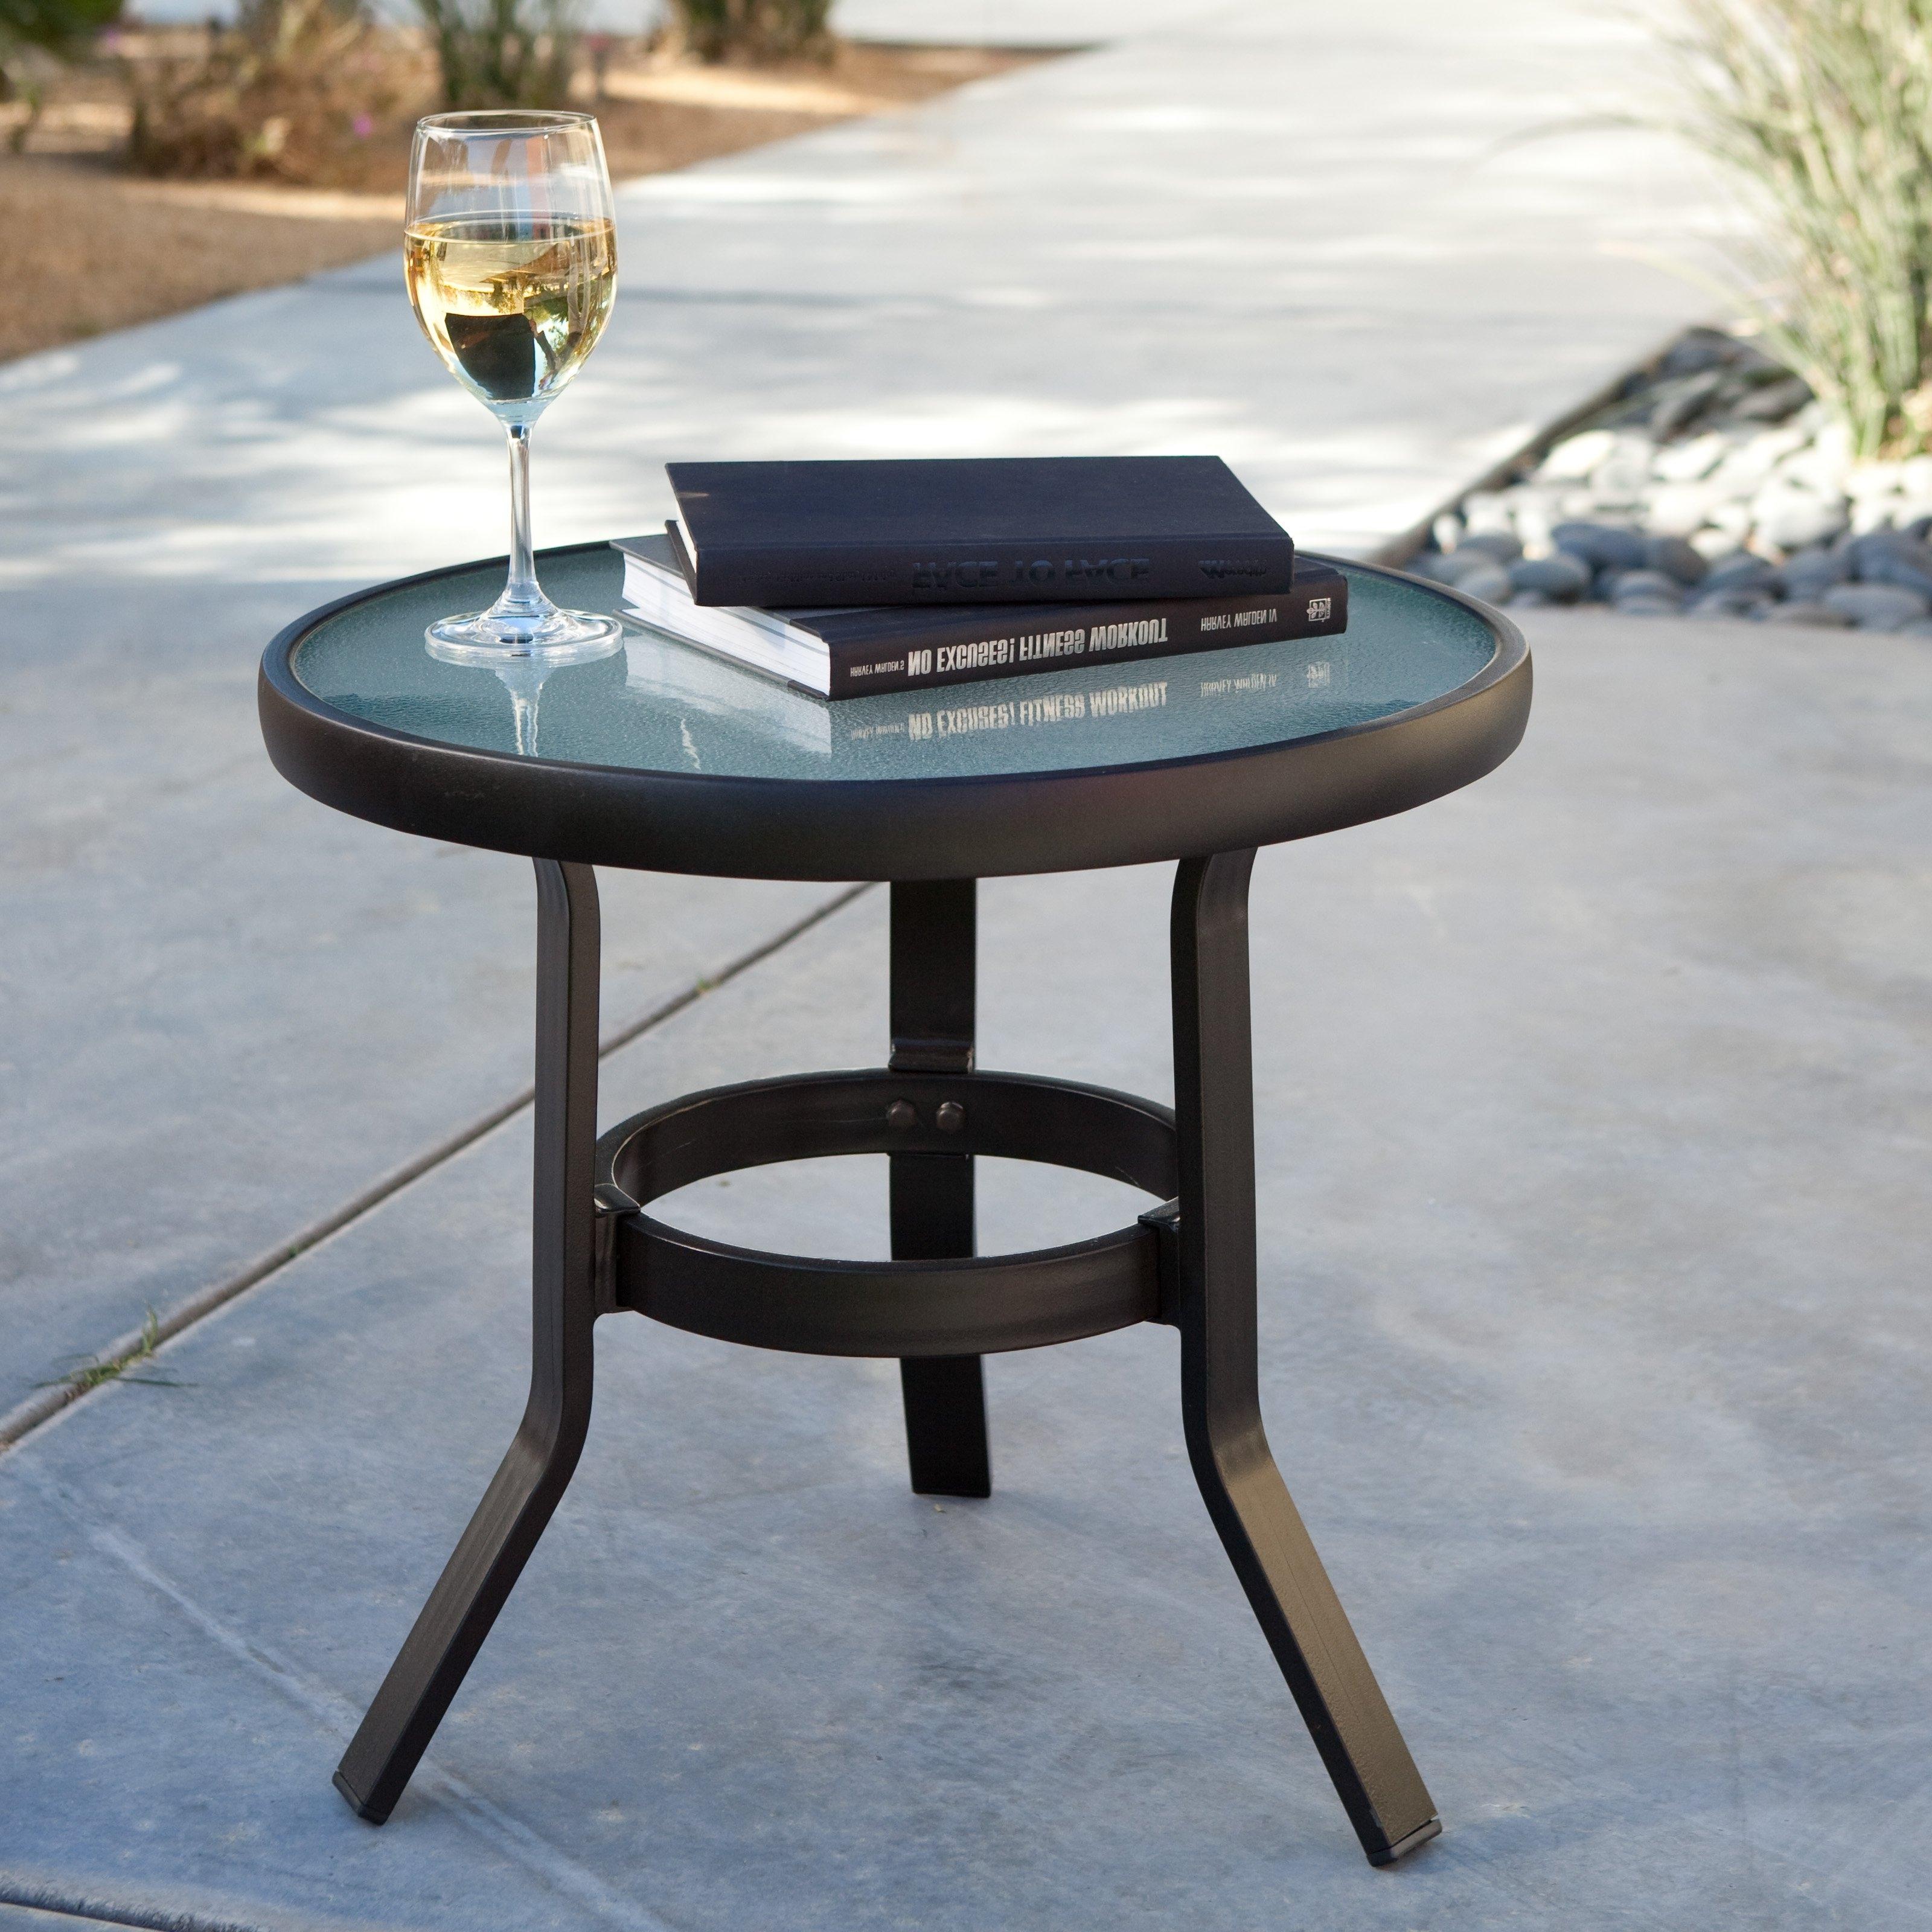 Small Patio Table With Umbrella Regarding Small Patio Tables With Umbrellas Hole (View 5 of 20)